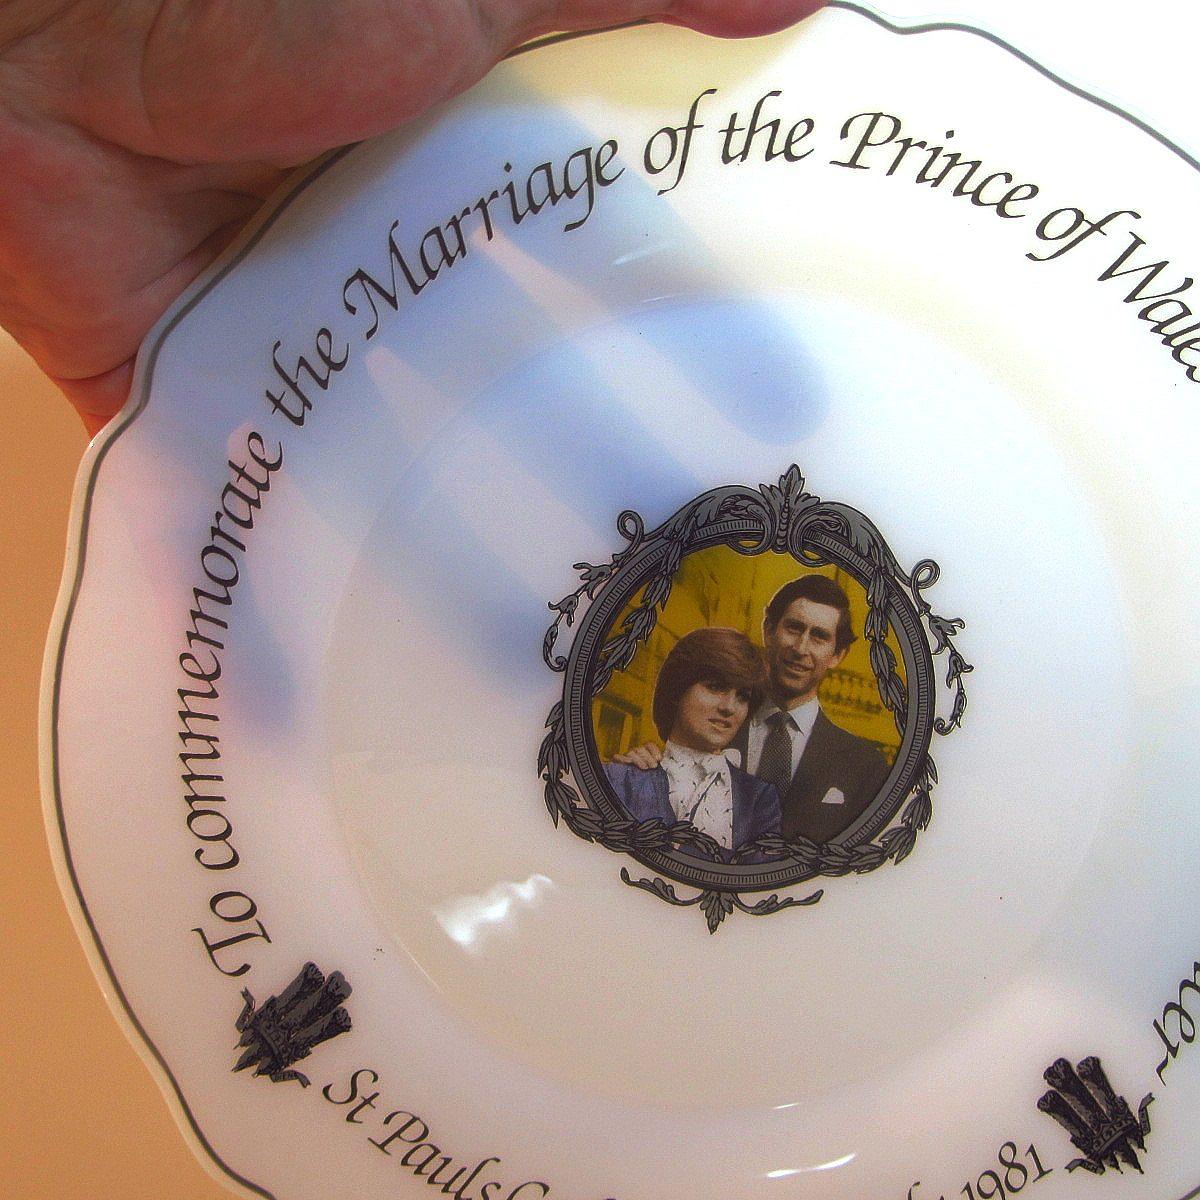 Prenses Diana & Prens Charles Düğün Hatırası Tabak Cam-Taş Objeler Arcopal